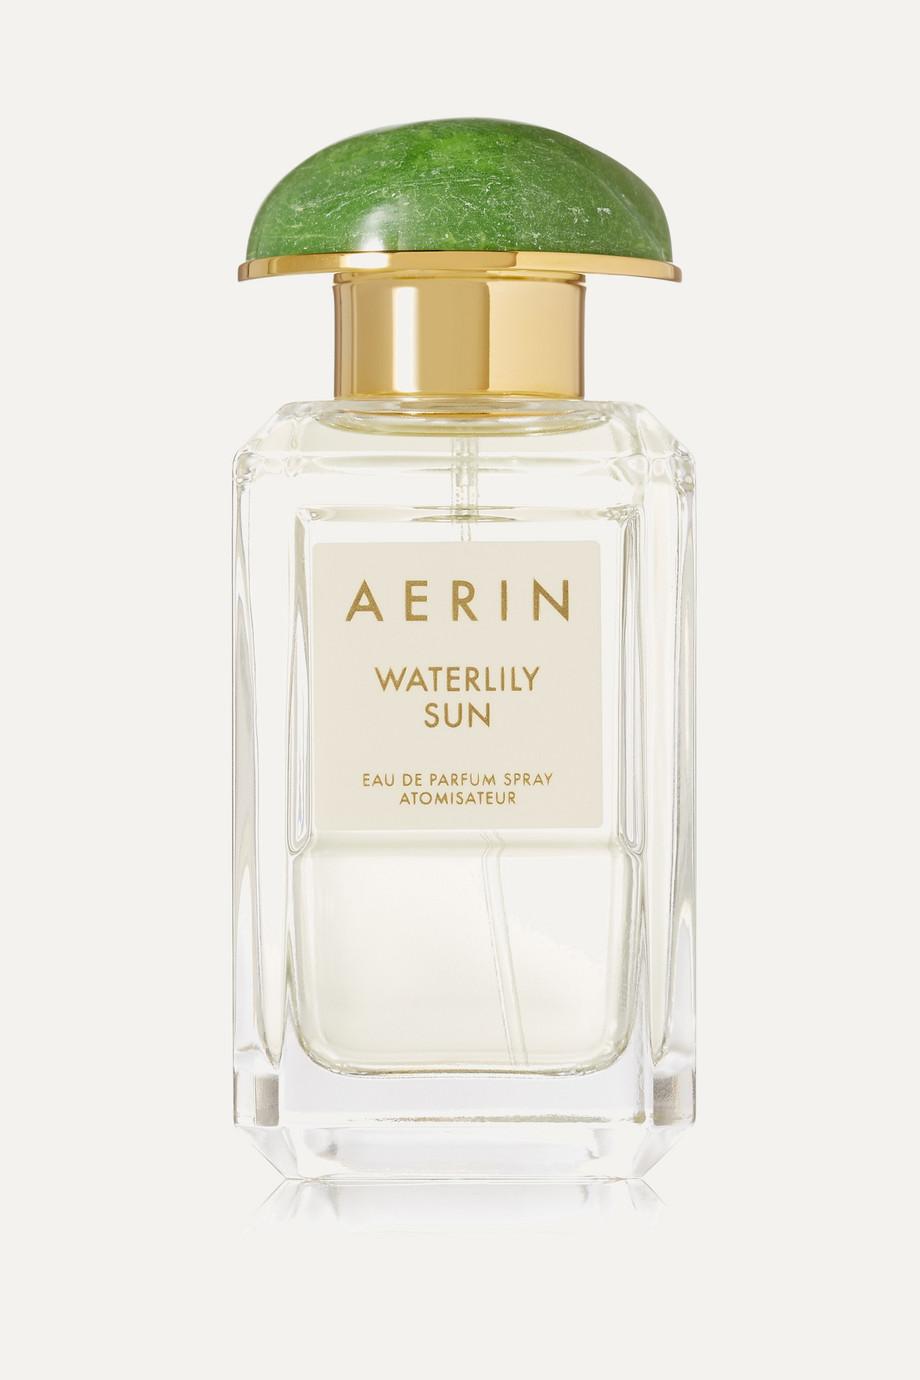 AERIN Beauty Waterlily Sun – Wasserlilie & Sizilianische Bergamotte, 50 ml – Eau de Parfum